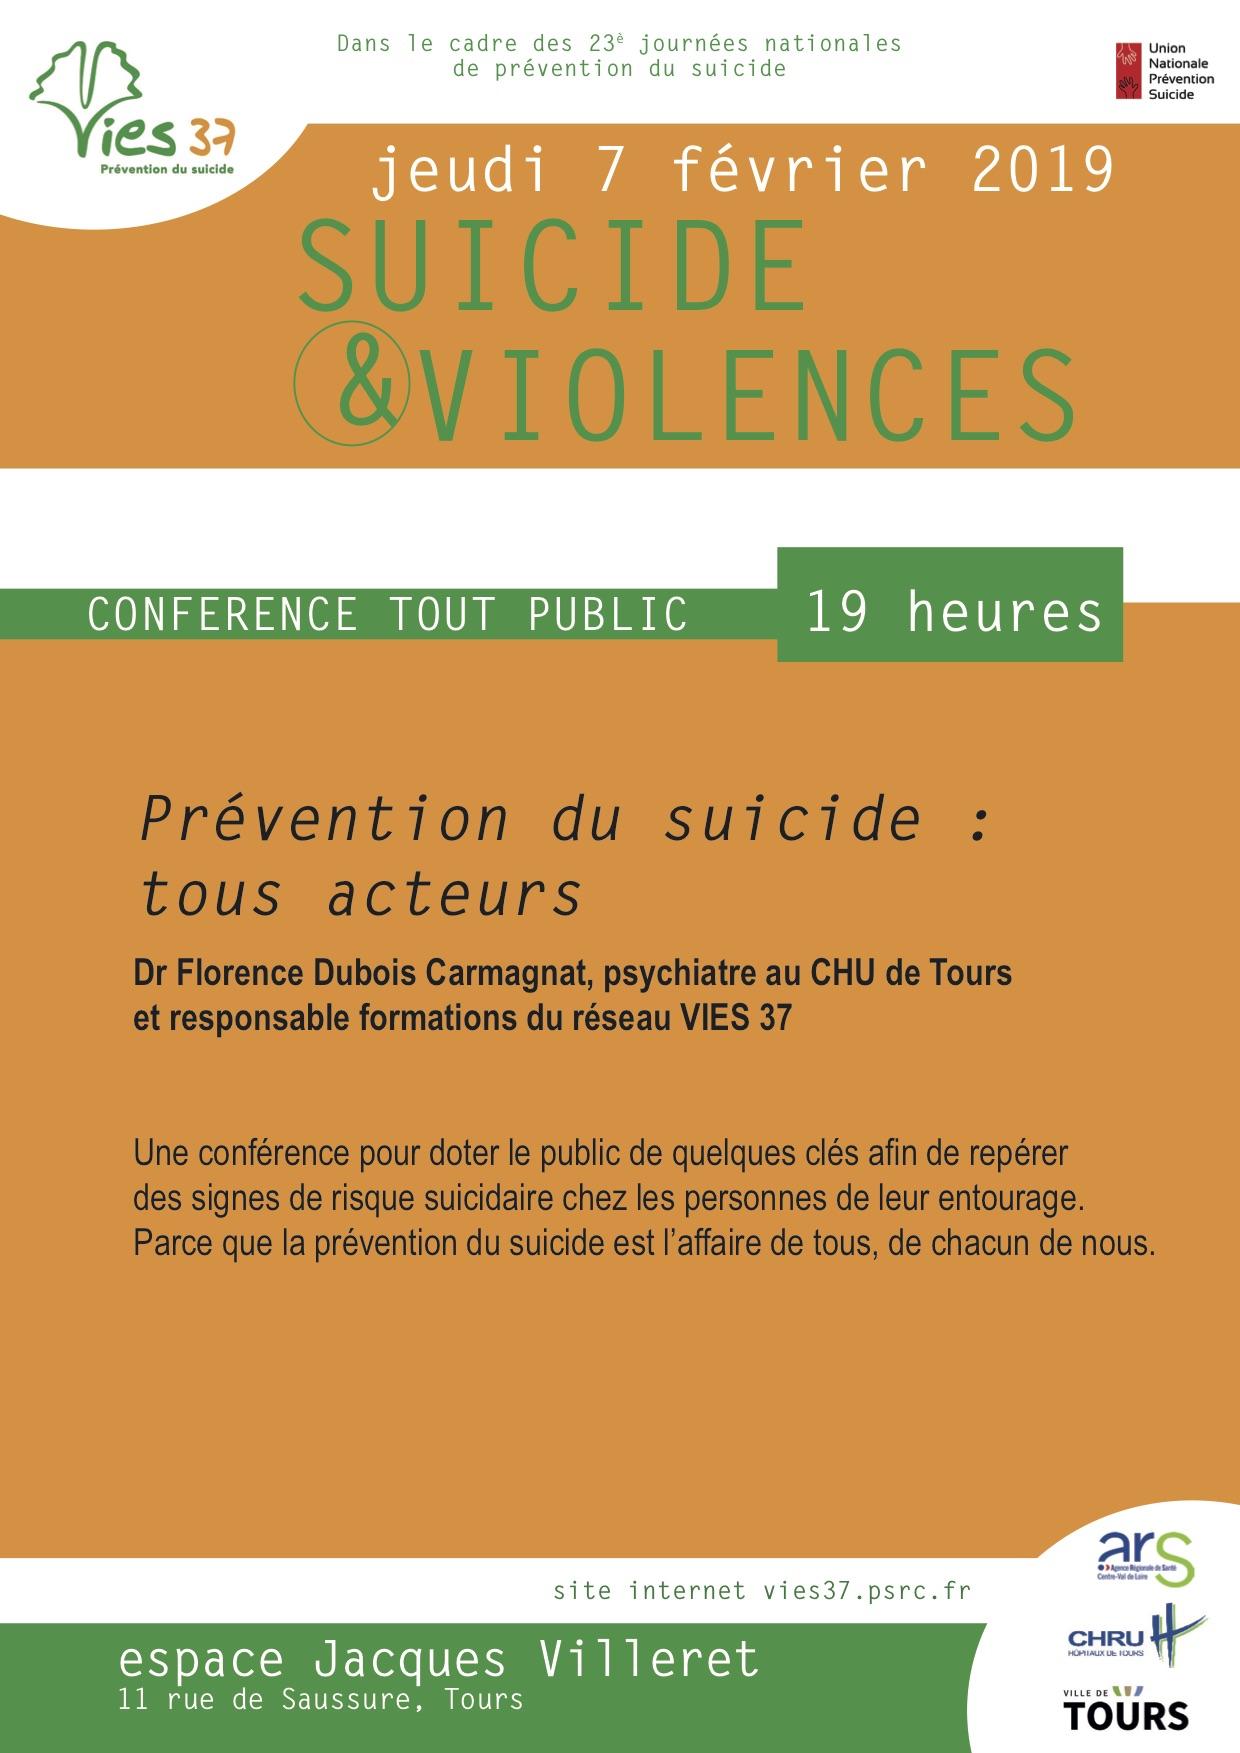 Suicide & violences, vies37